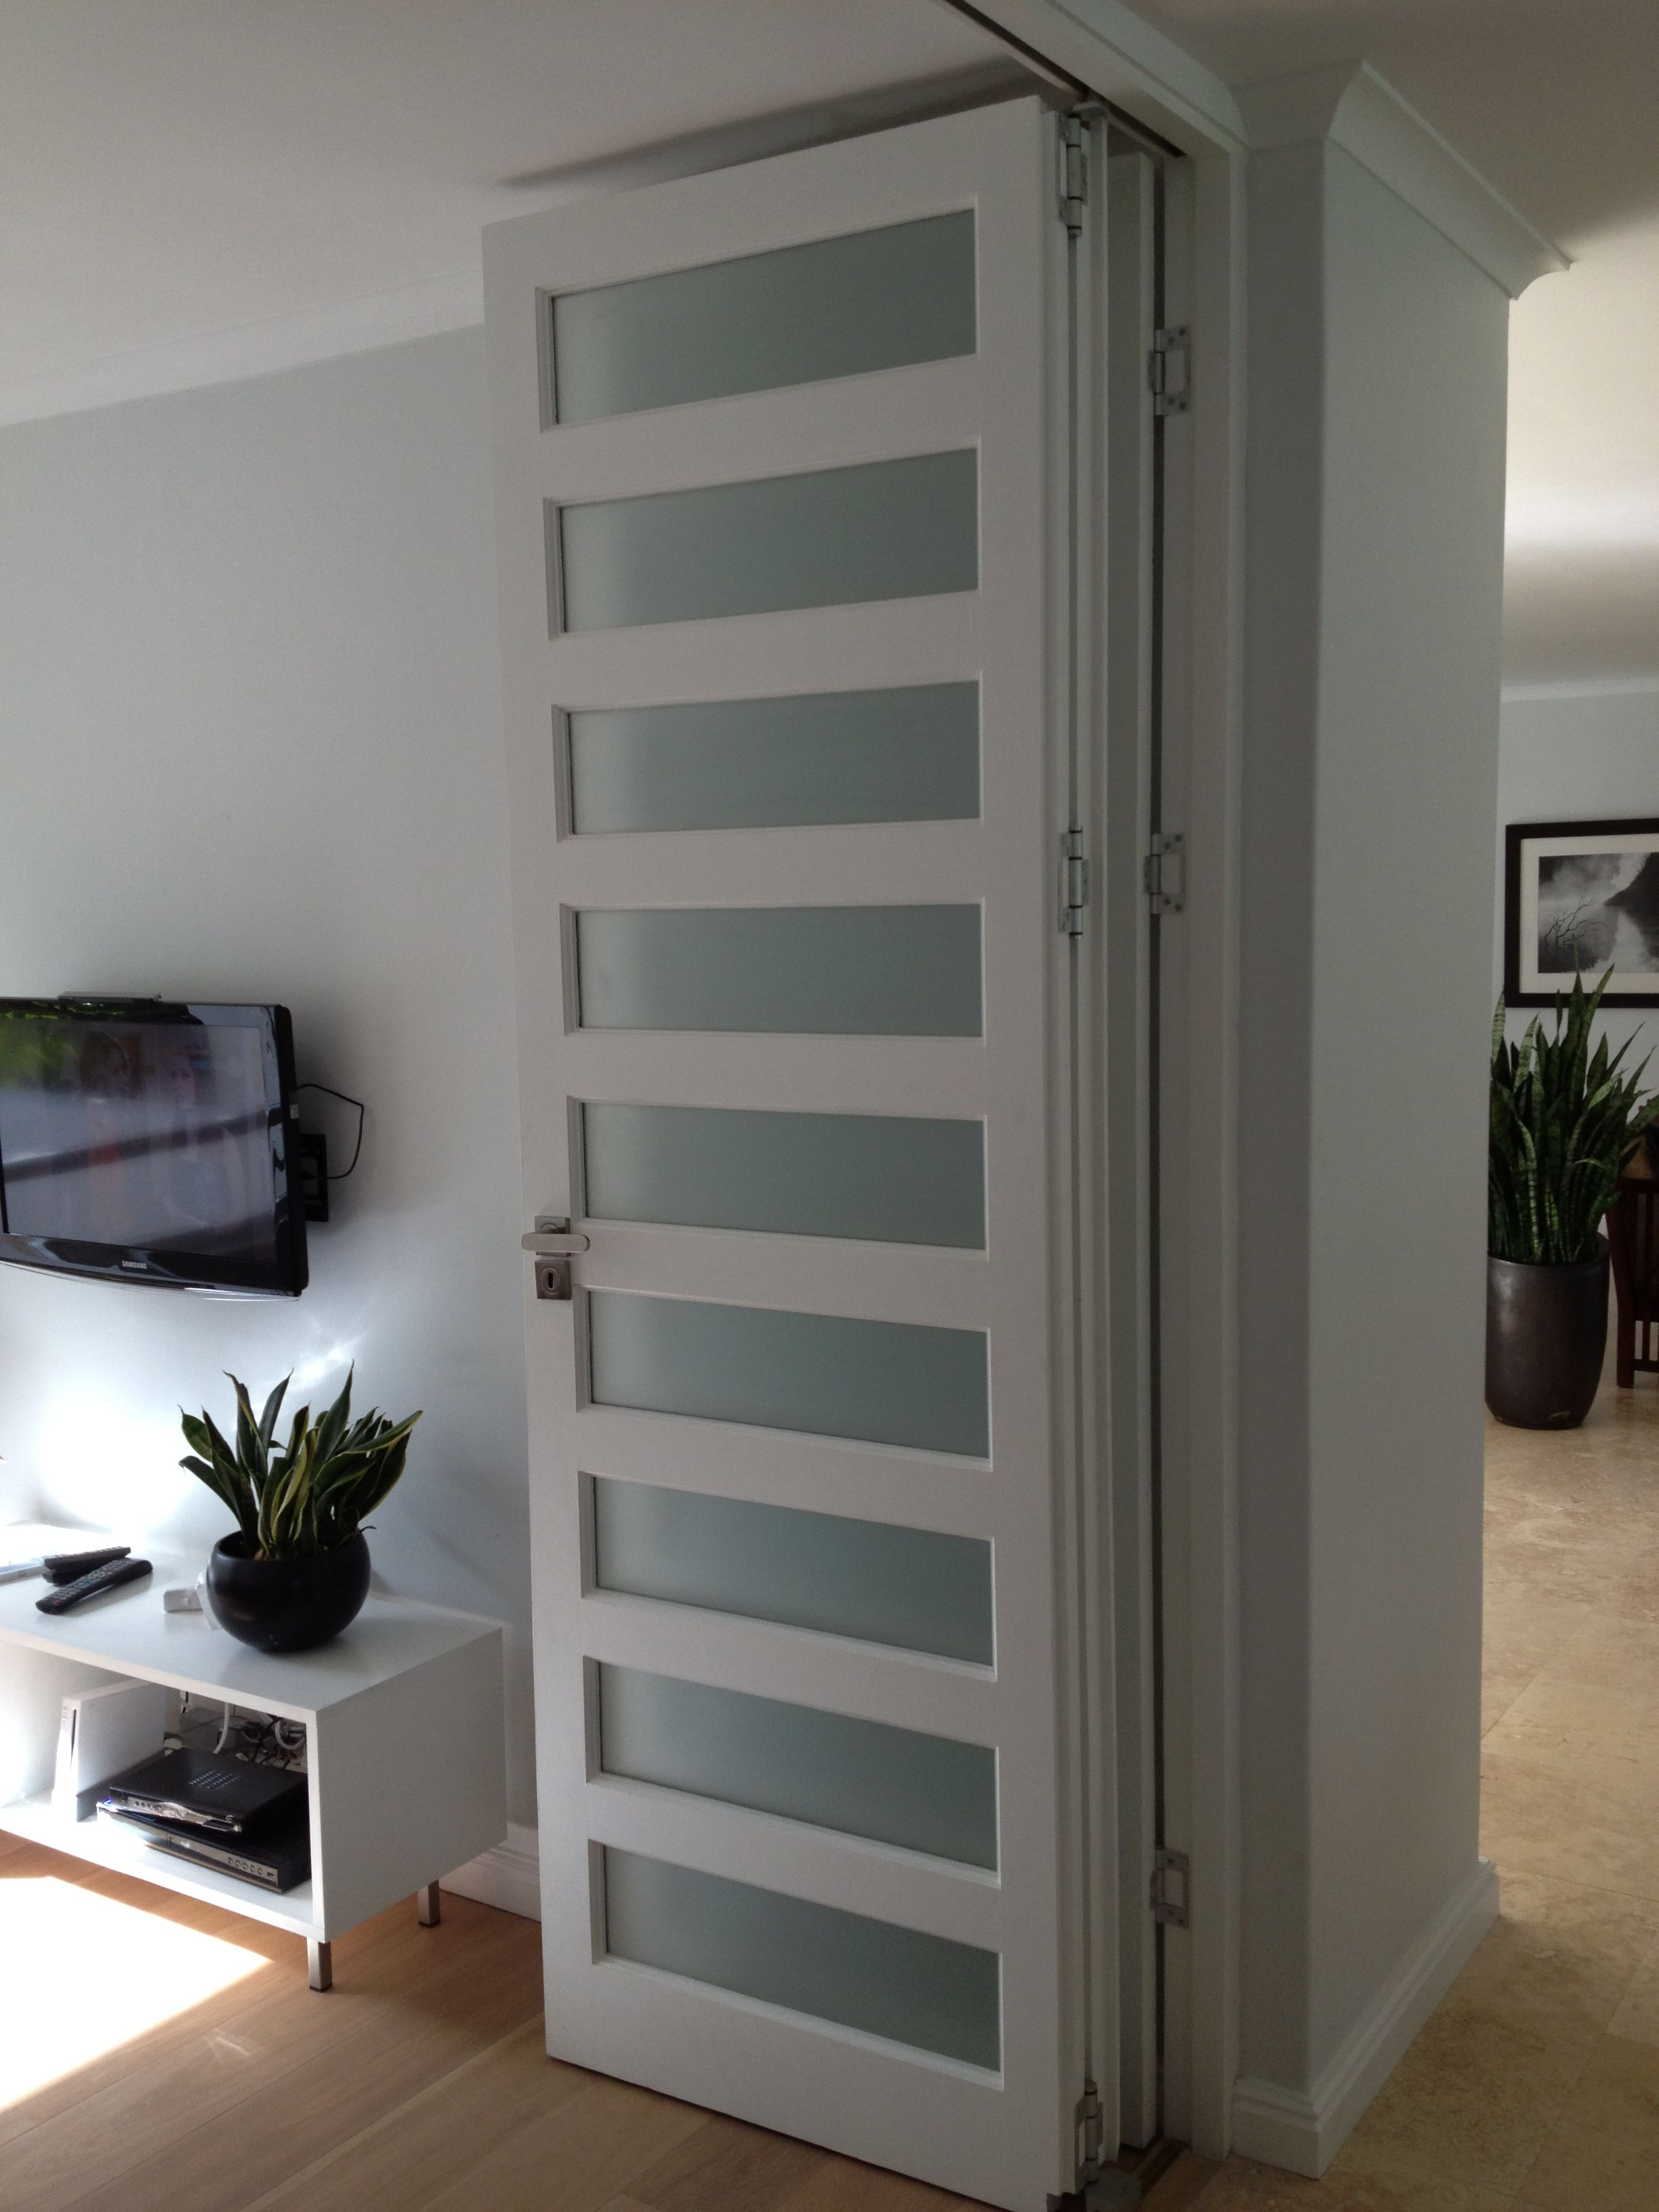 Folding Room Divider By Door And Window Decor Www Doorsystems Co Za Room Divider Doors Sliding Room Dividers Fabric Room Dividers